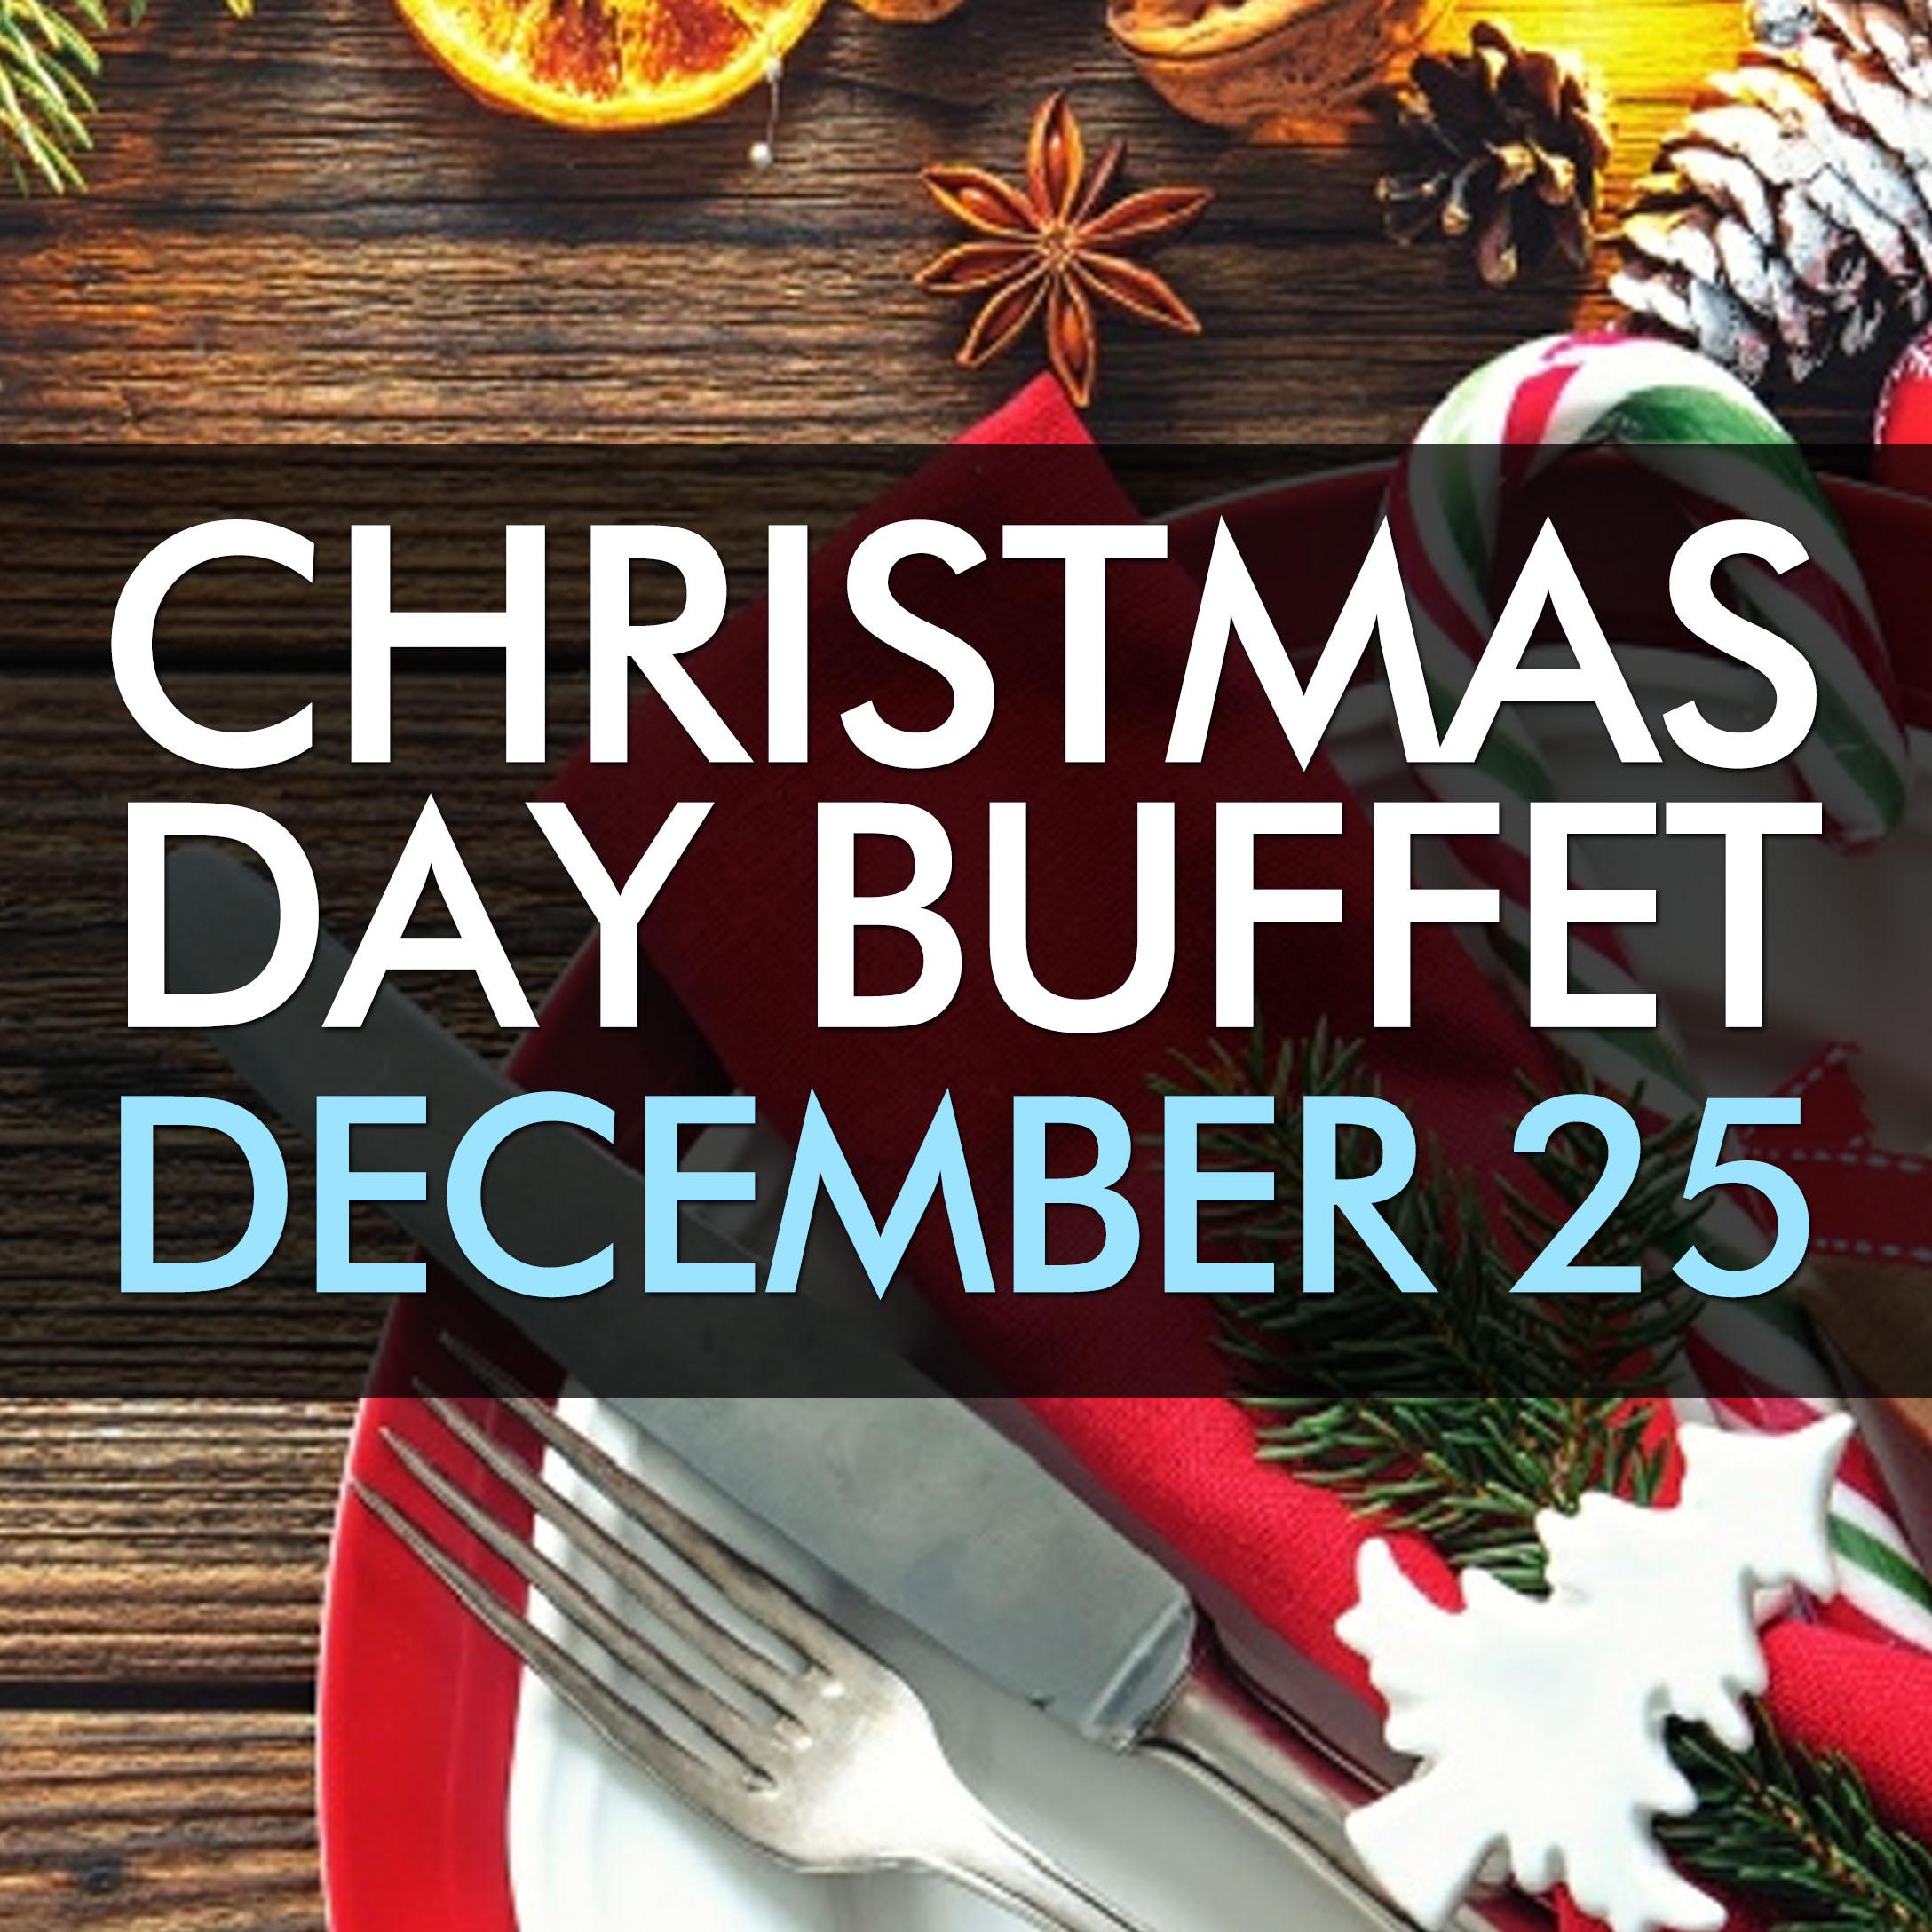 Cincinnati Restaurants Open Christmas Dpeve 2020 Buffet On Christmas Day 2020 – Christmas Guide